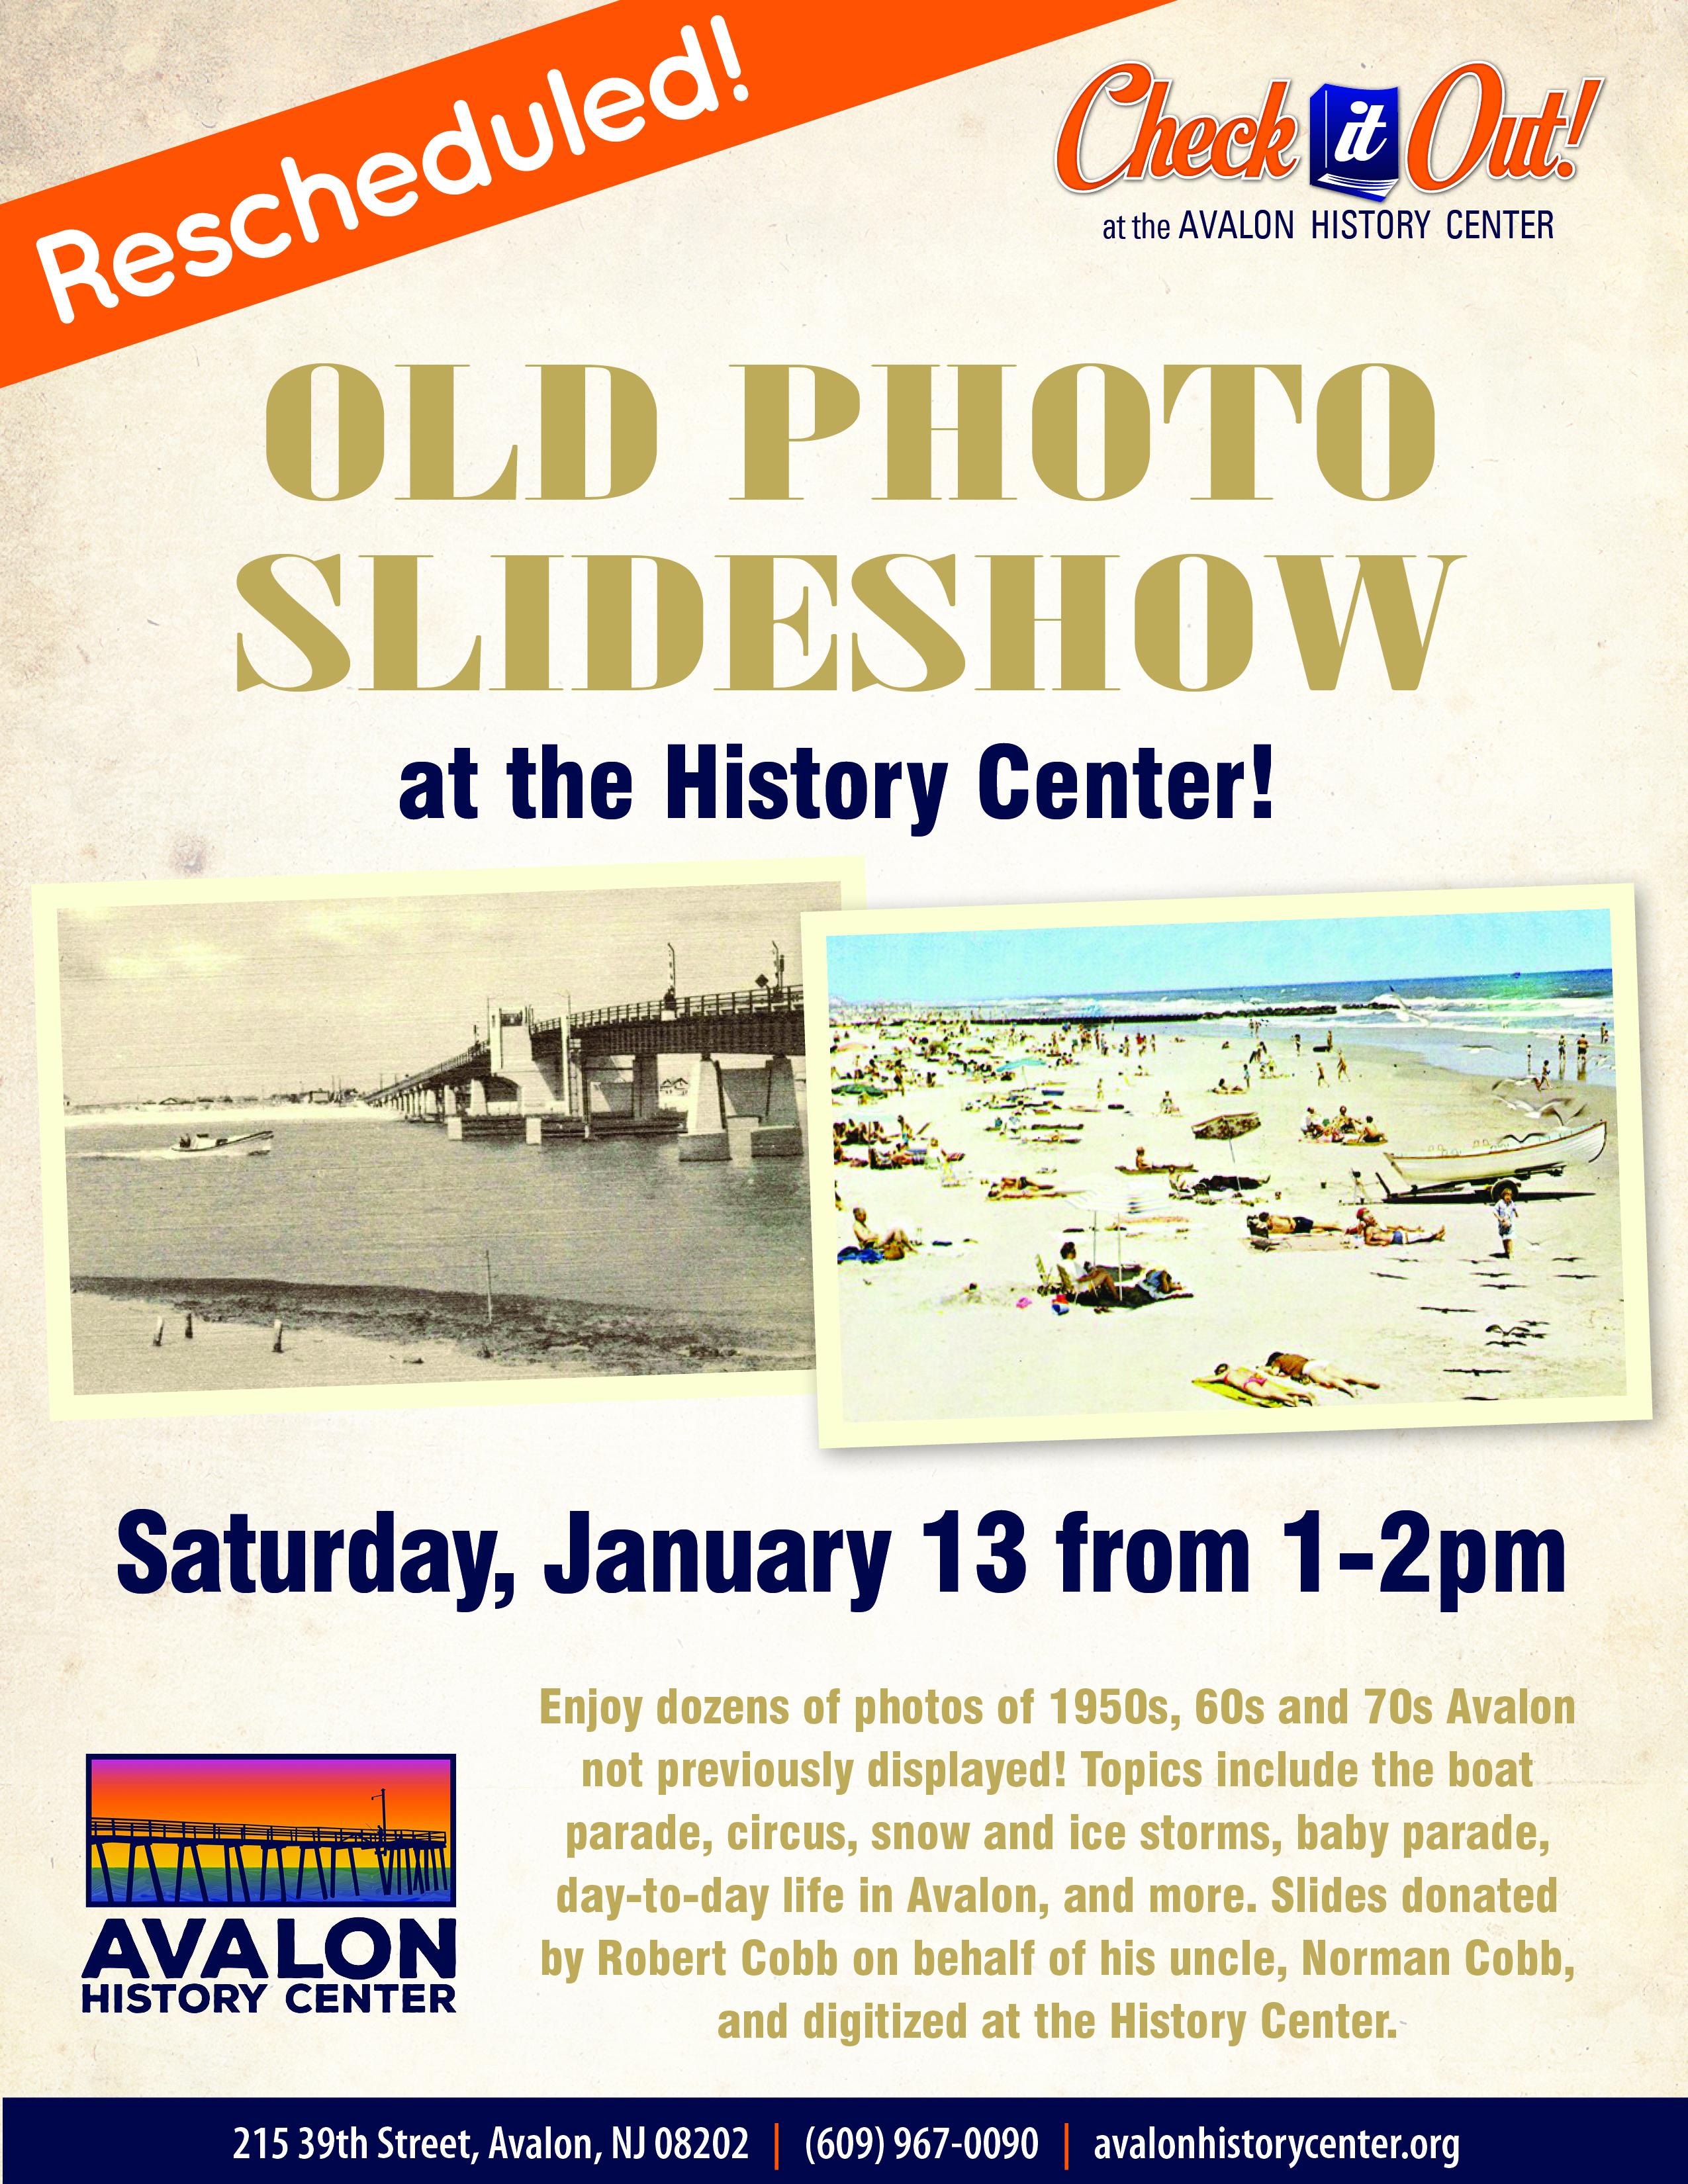 Avalon history center old photo event rescheduled for january 13th avalon history center old photo event rescheduled for january 13th 1betcityfo Images